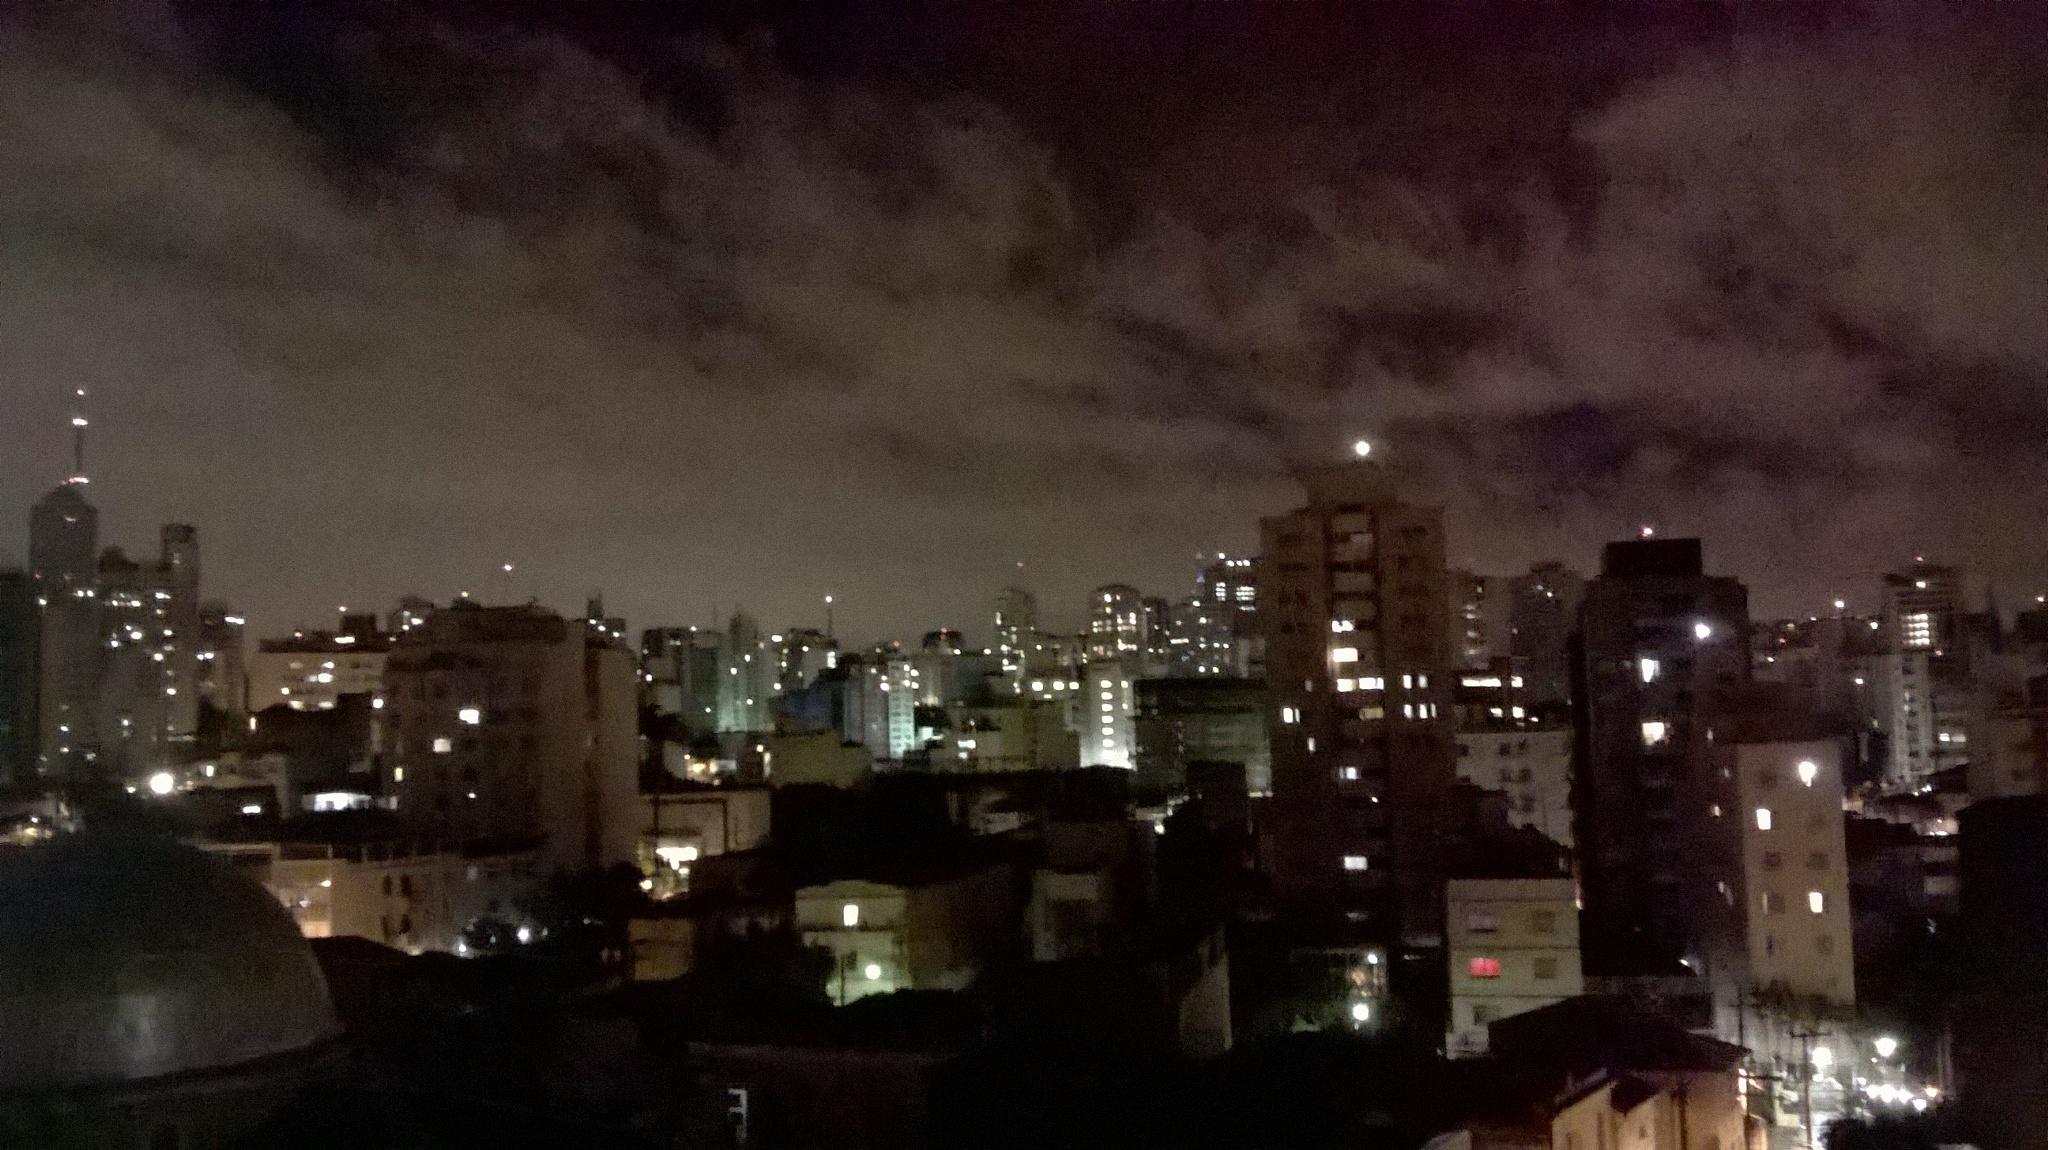 Noite nublada by Darci Ferreira Holanda